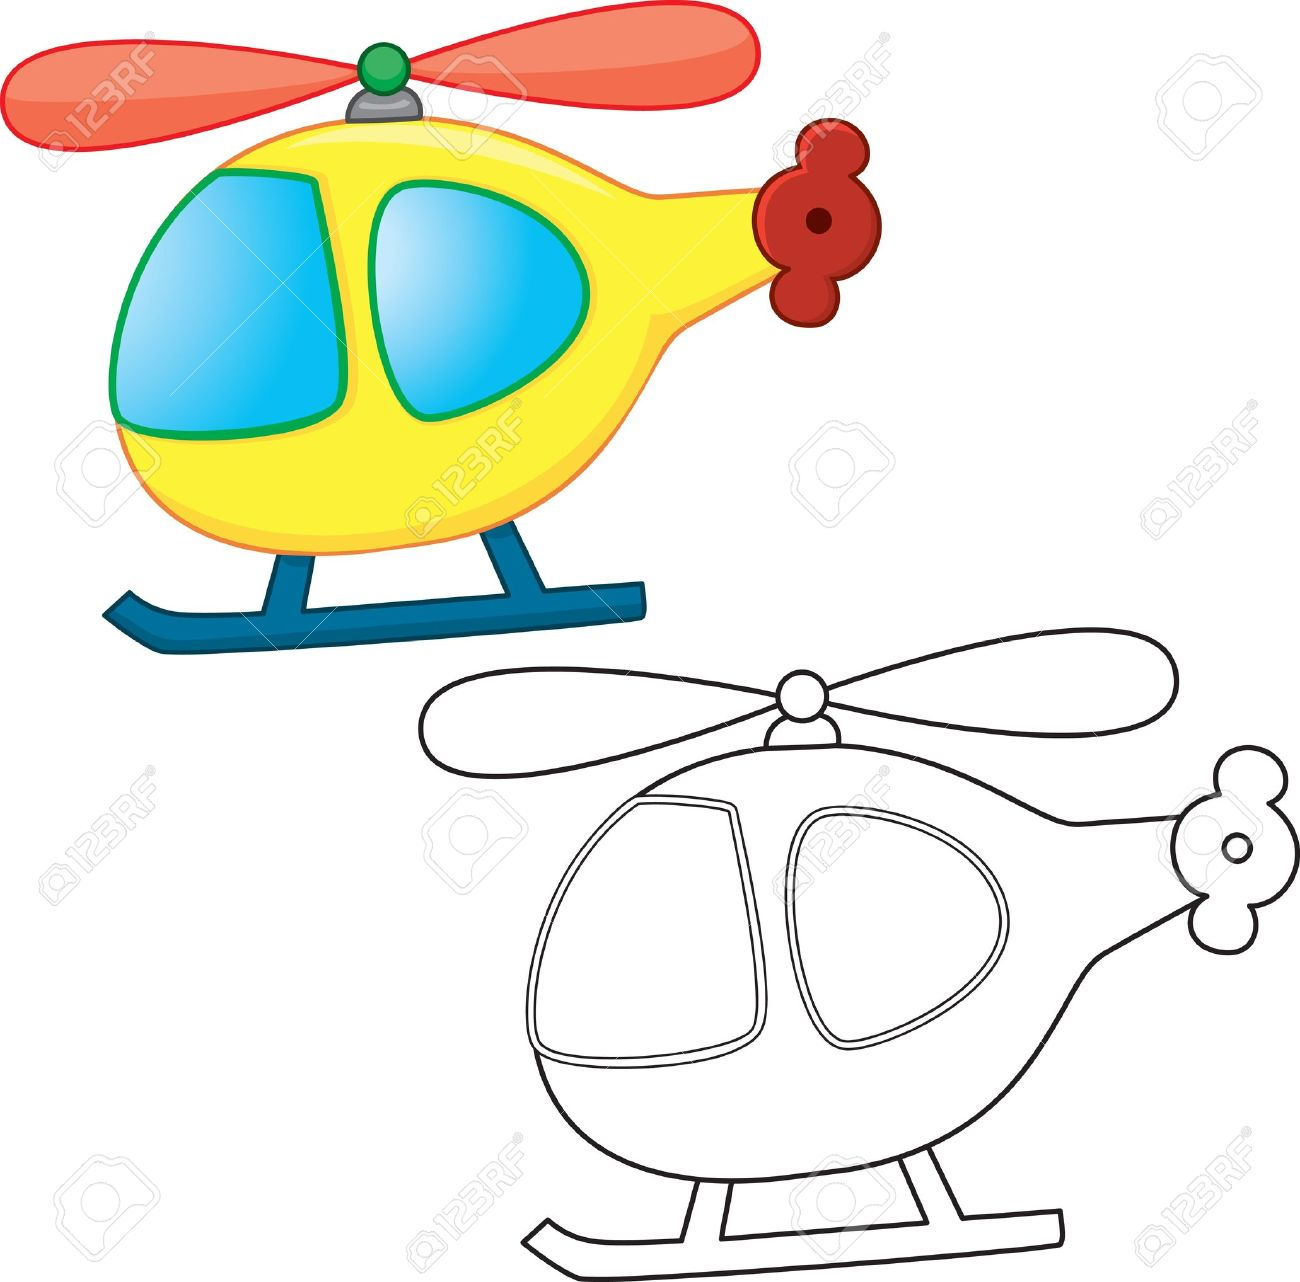 Toy Helicopter Coloring Book Royalty Free Klipartlar Vektör